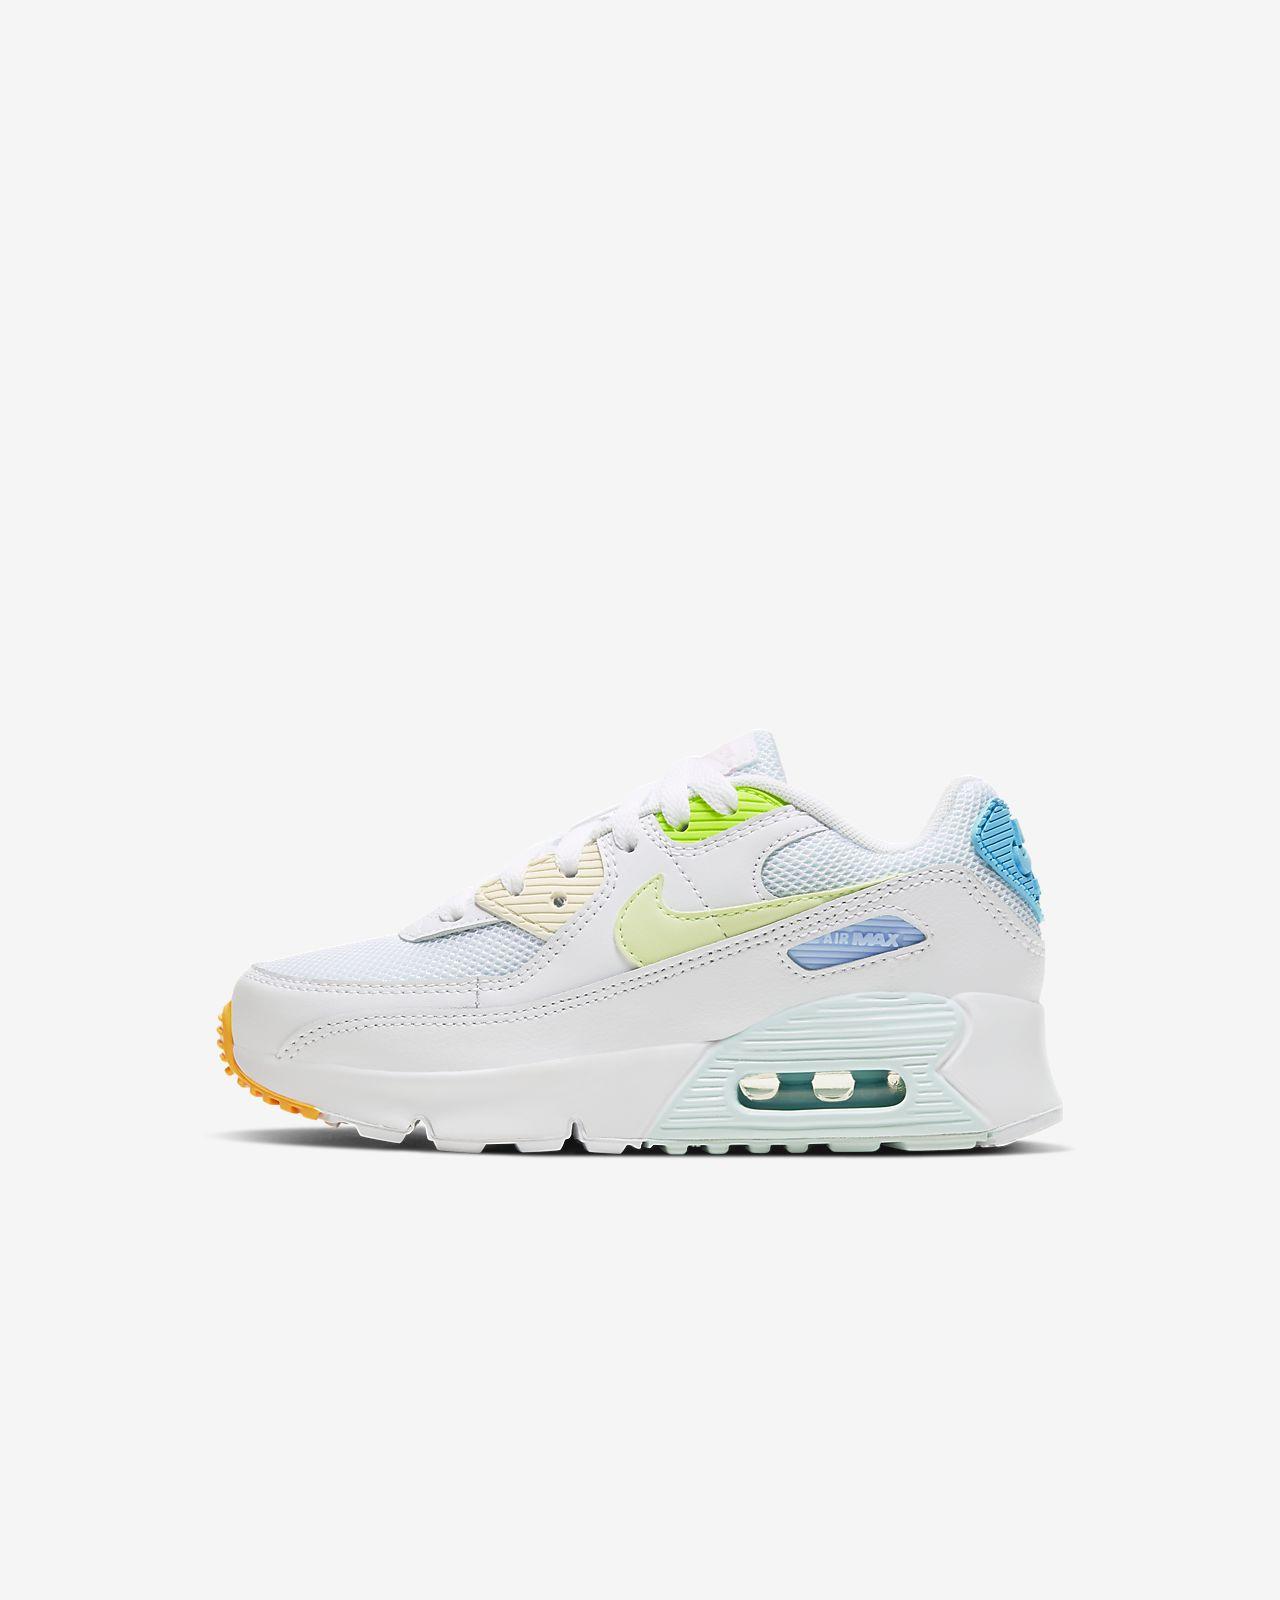 nike air max 90 chaussure pour très petite fille